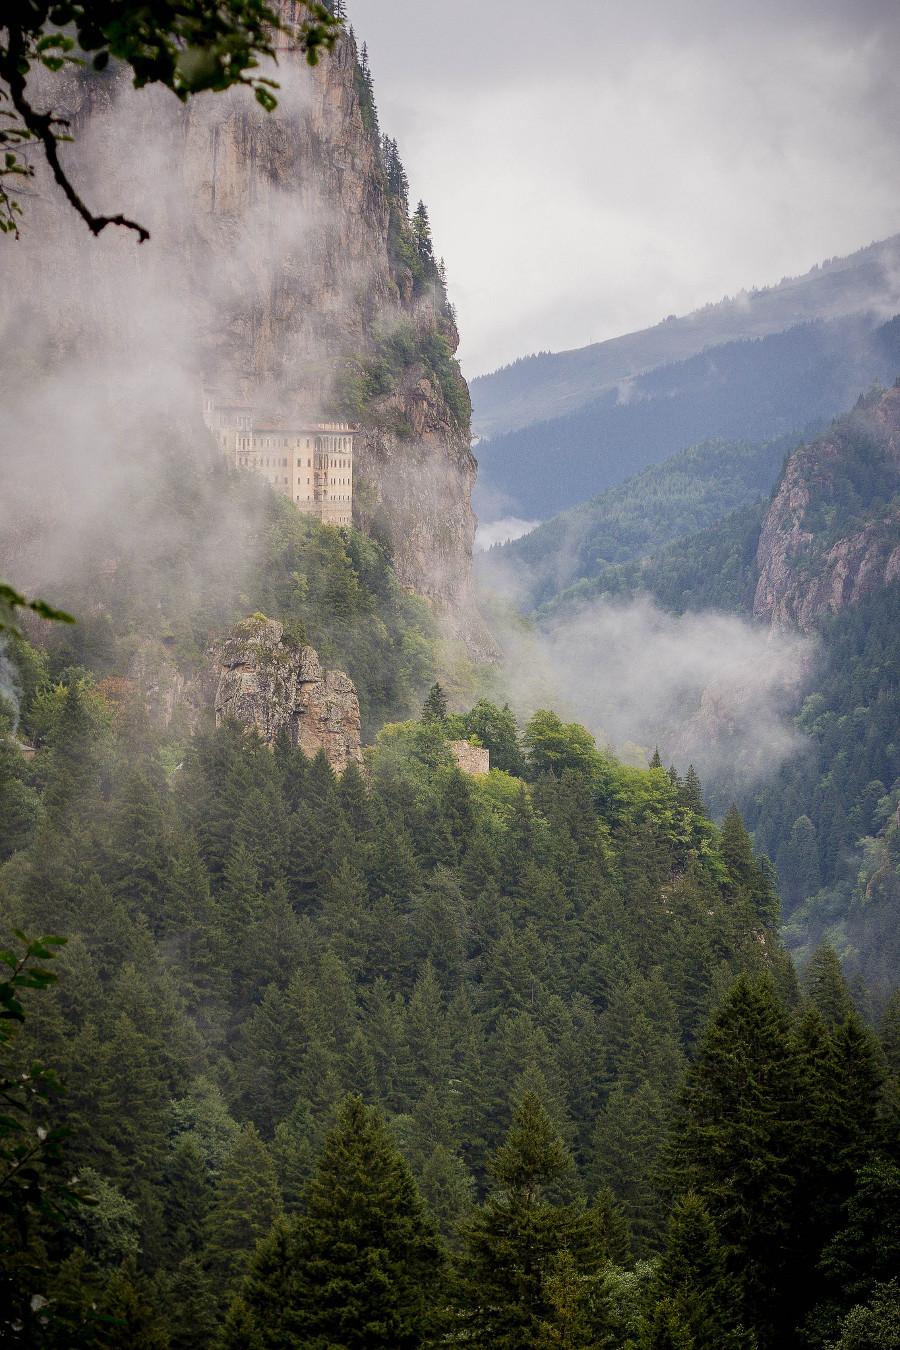 Anatolian mountains Sumela monastery